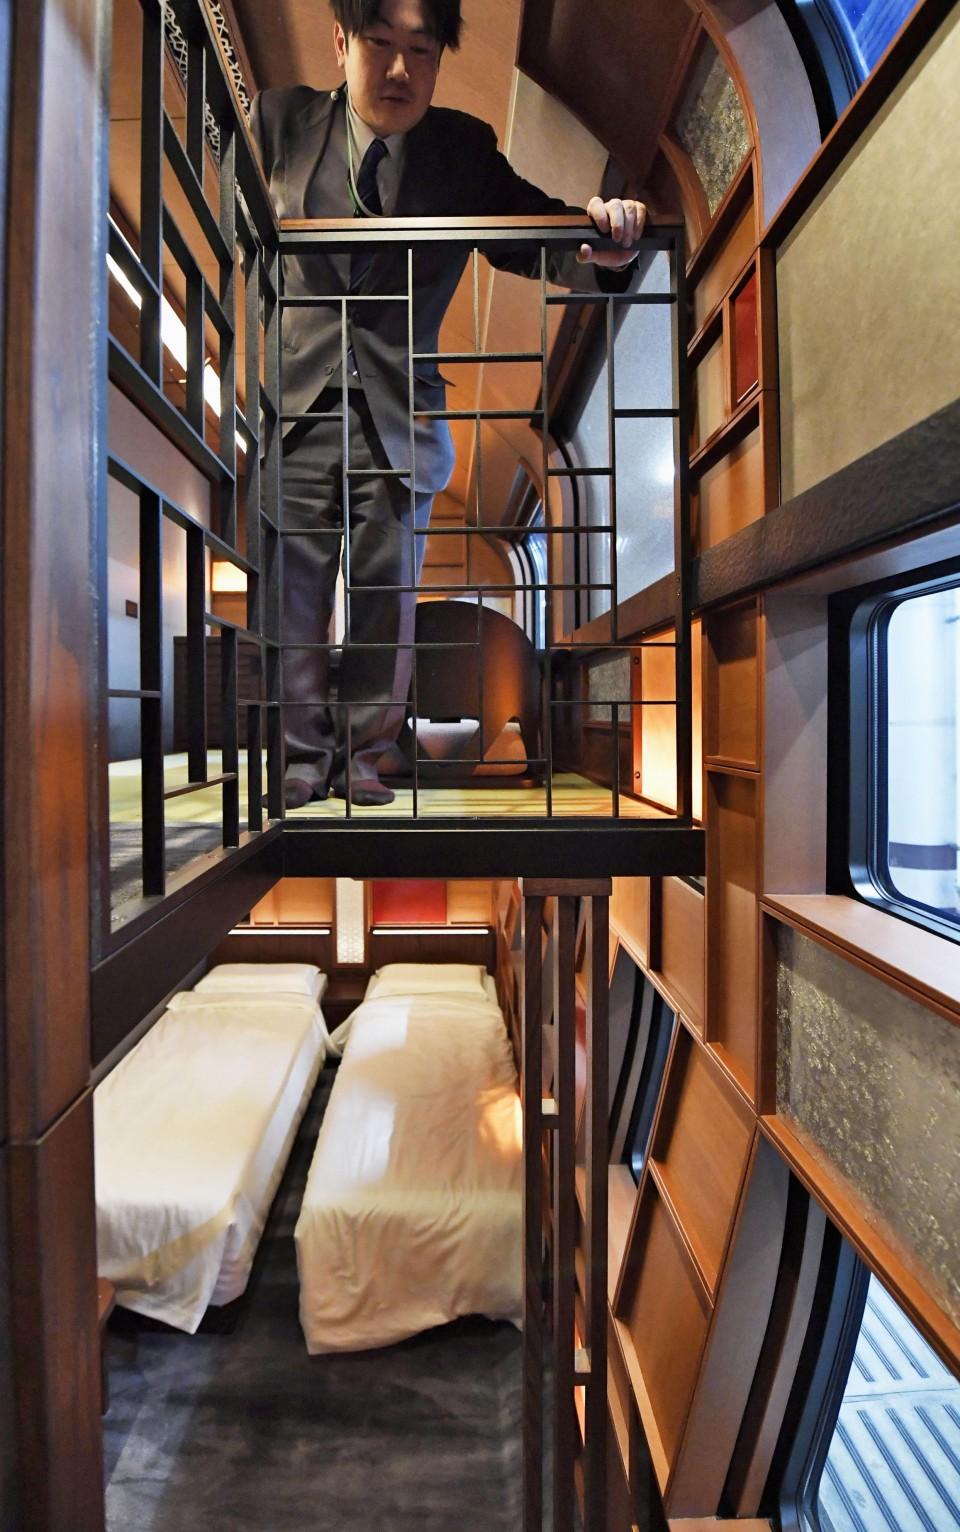 Gallery Luxury Sleeper Train Quot Shiki Shima Quot Begins